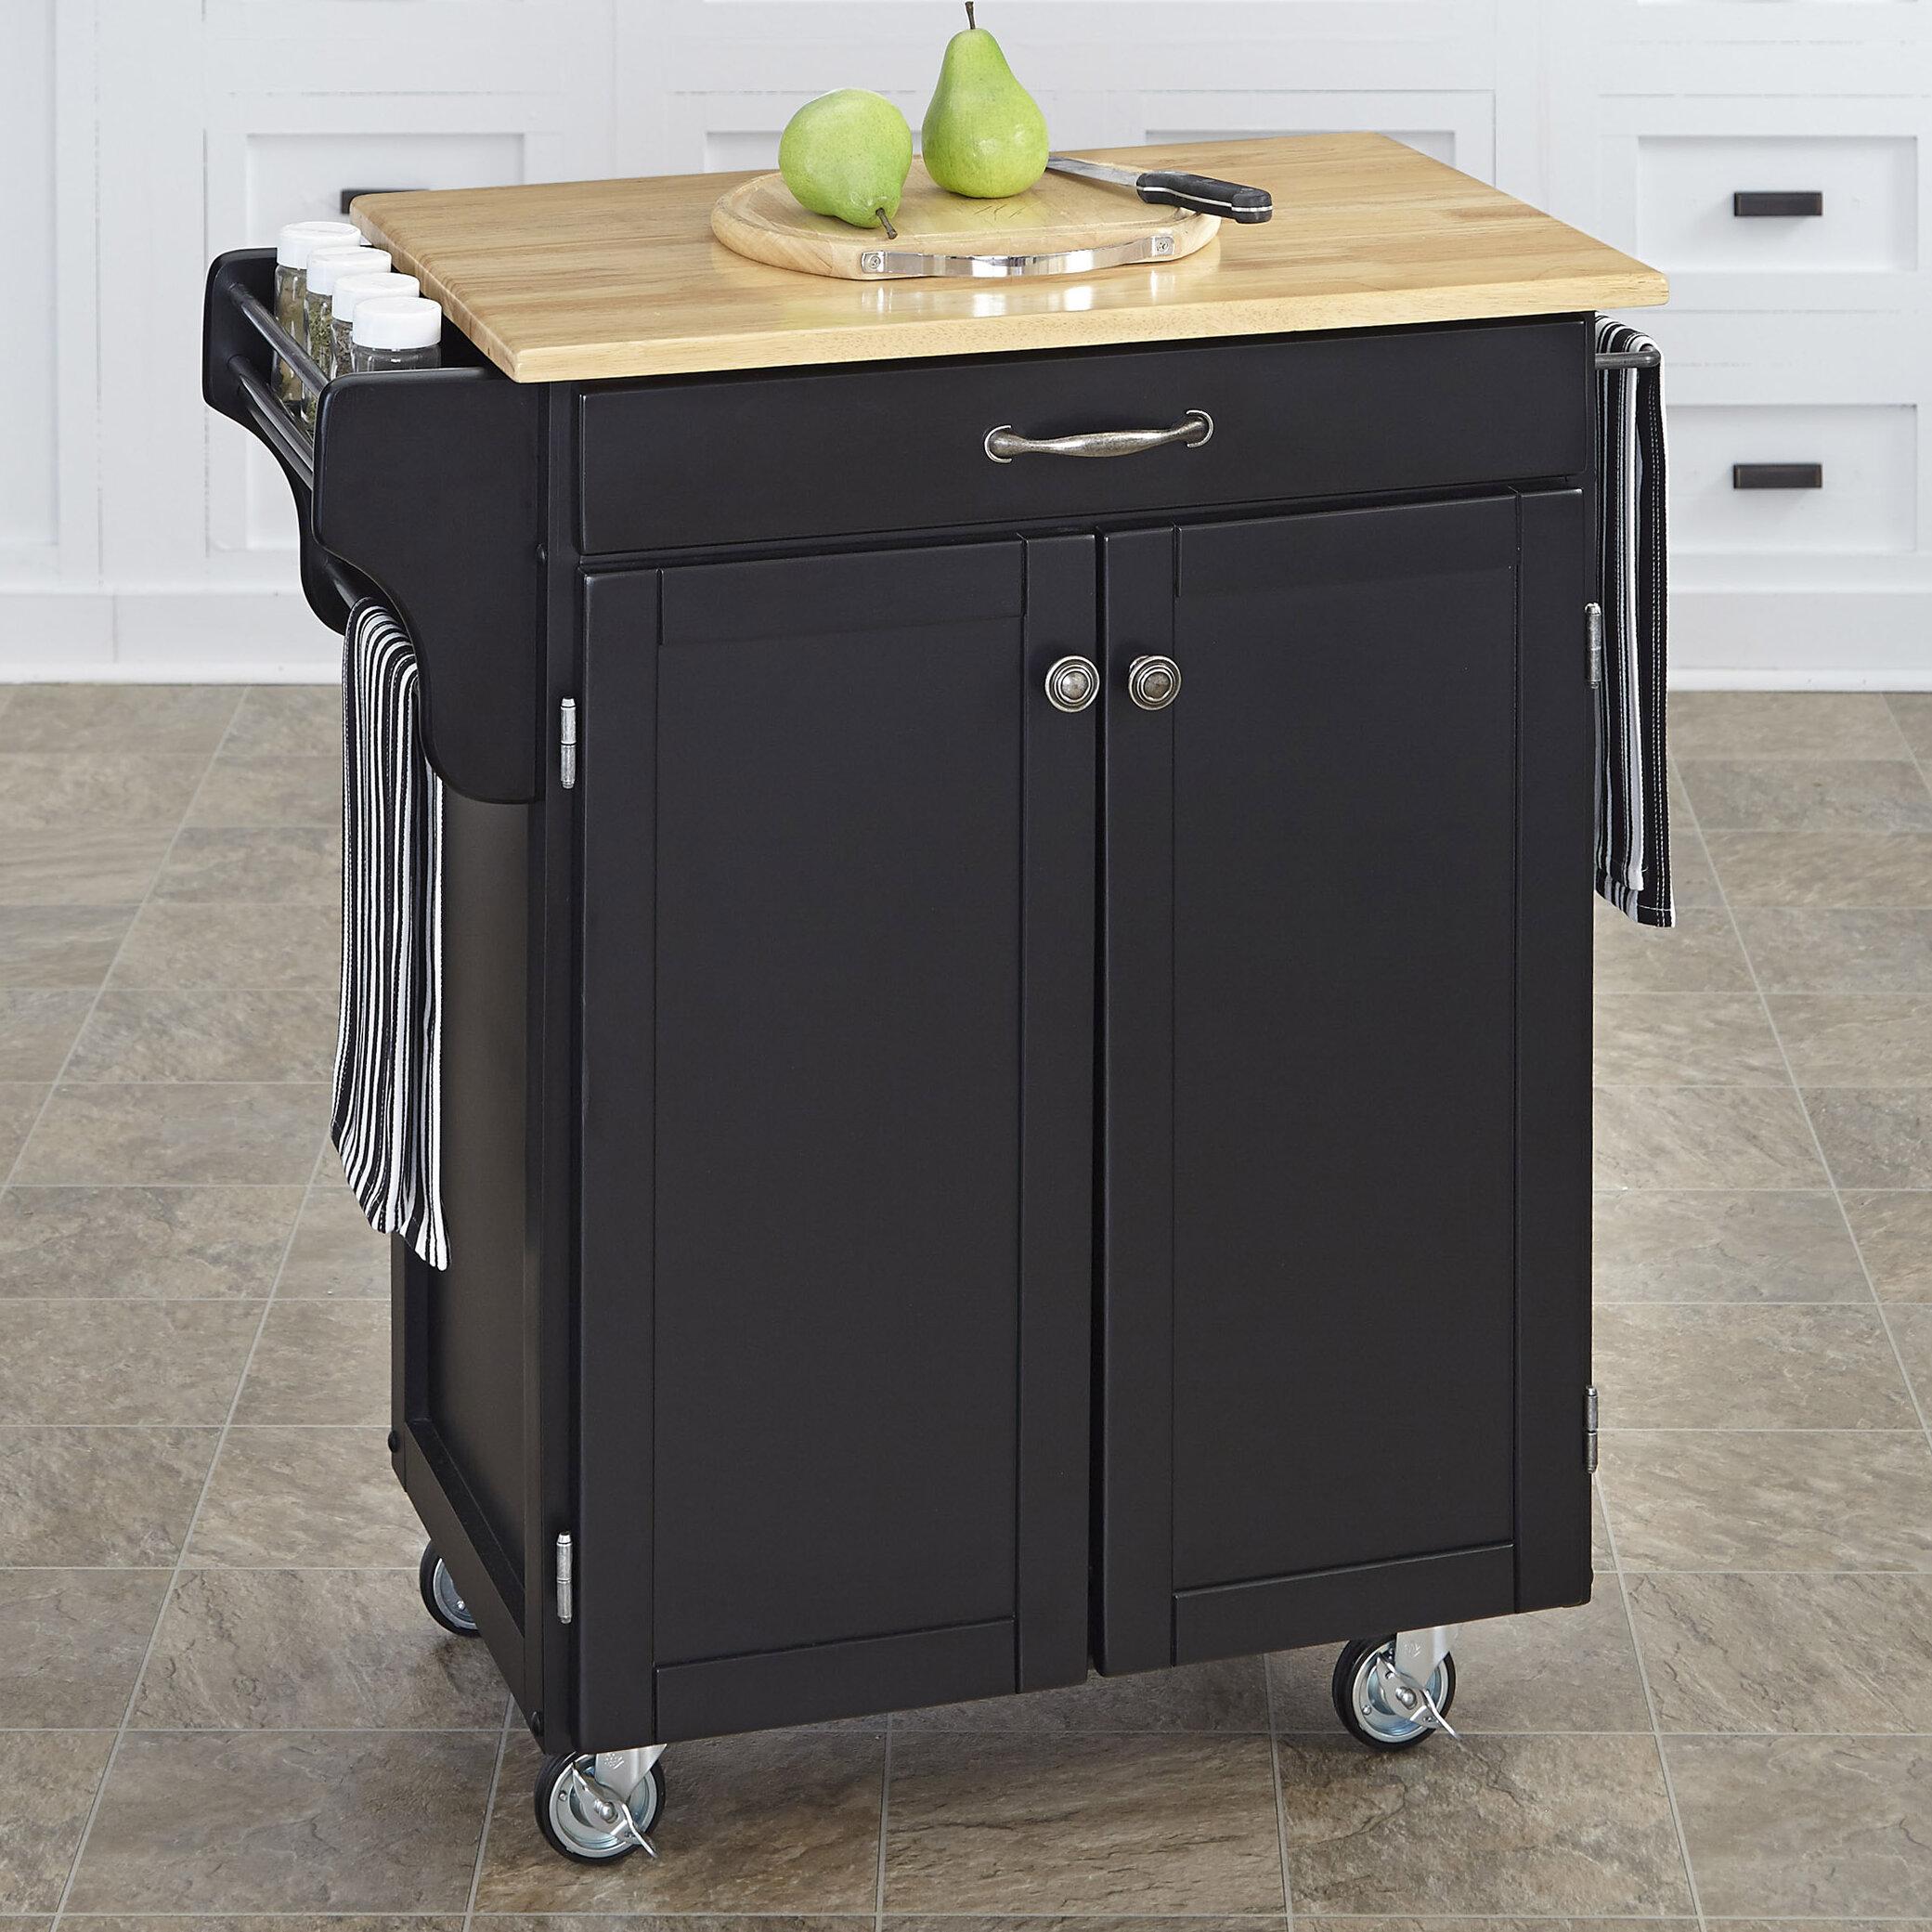 Black Kitchen Islands Carts You Ll Love In 2020 Wayfair